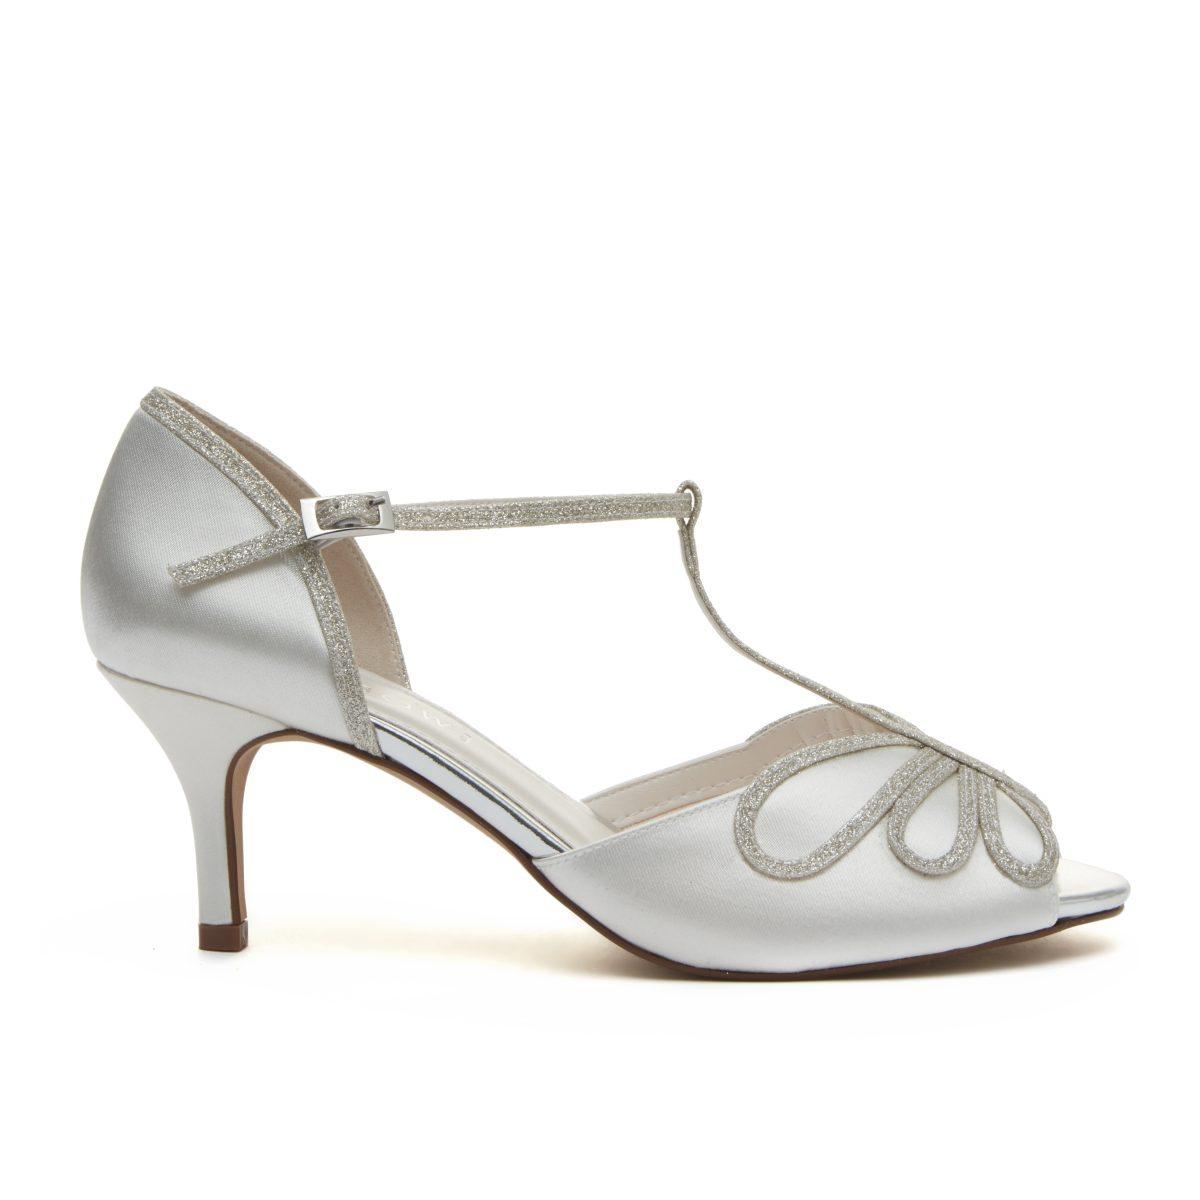 Rainbow Club Harlow - Peep Toe Satin/ Silver Shimmer Shoe 2